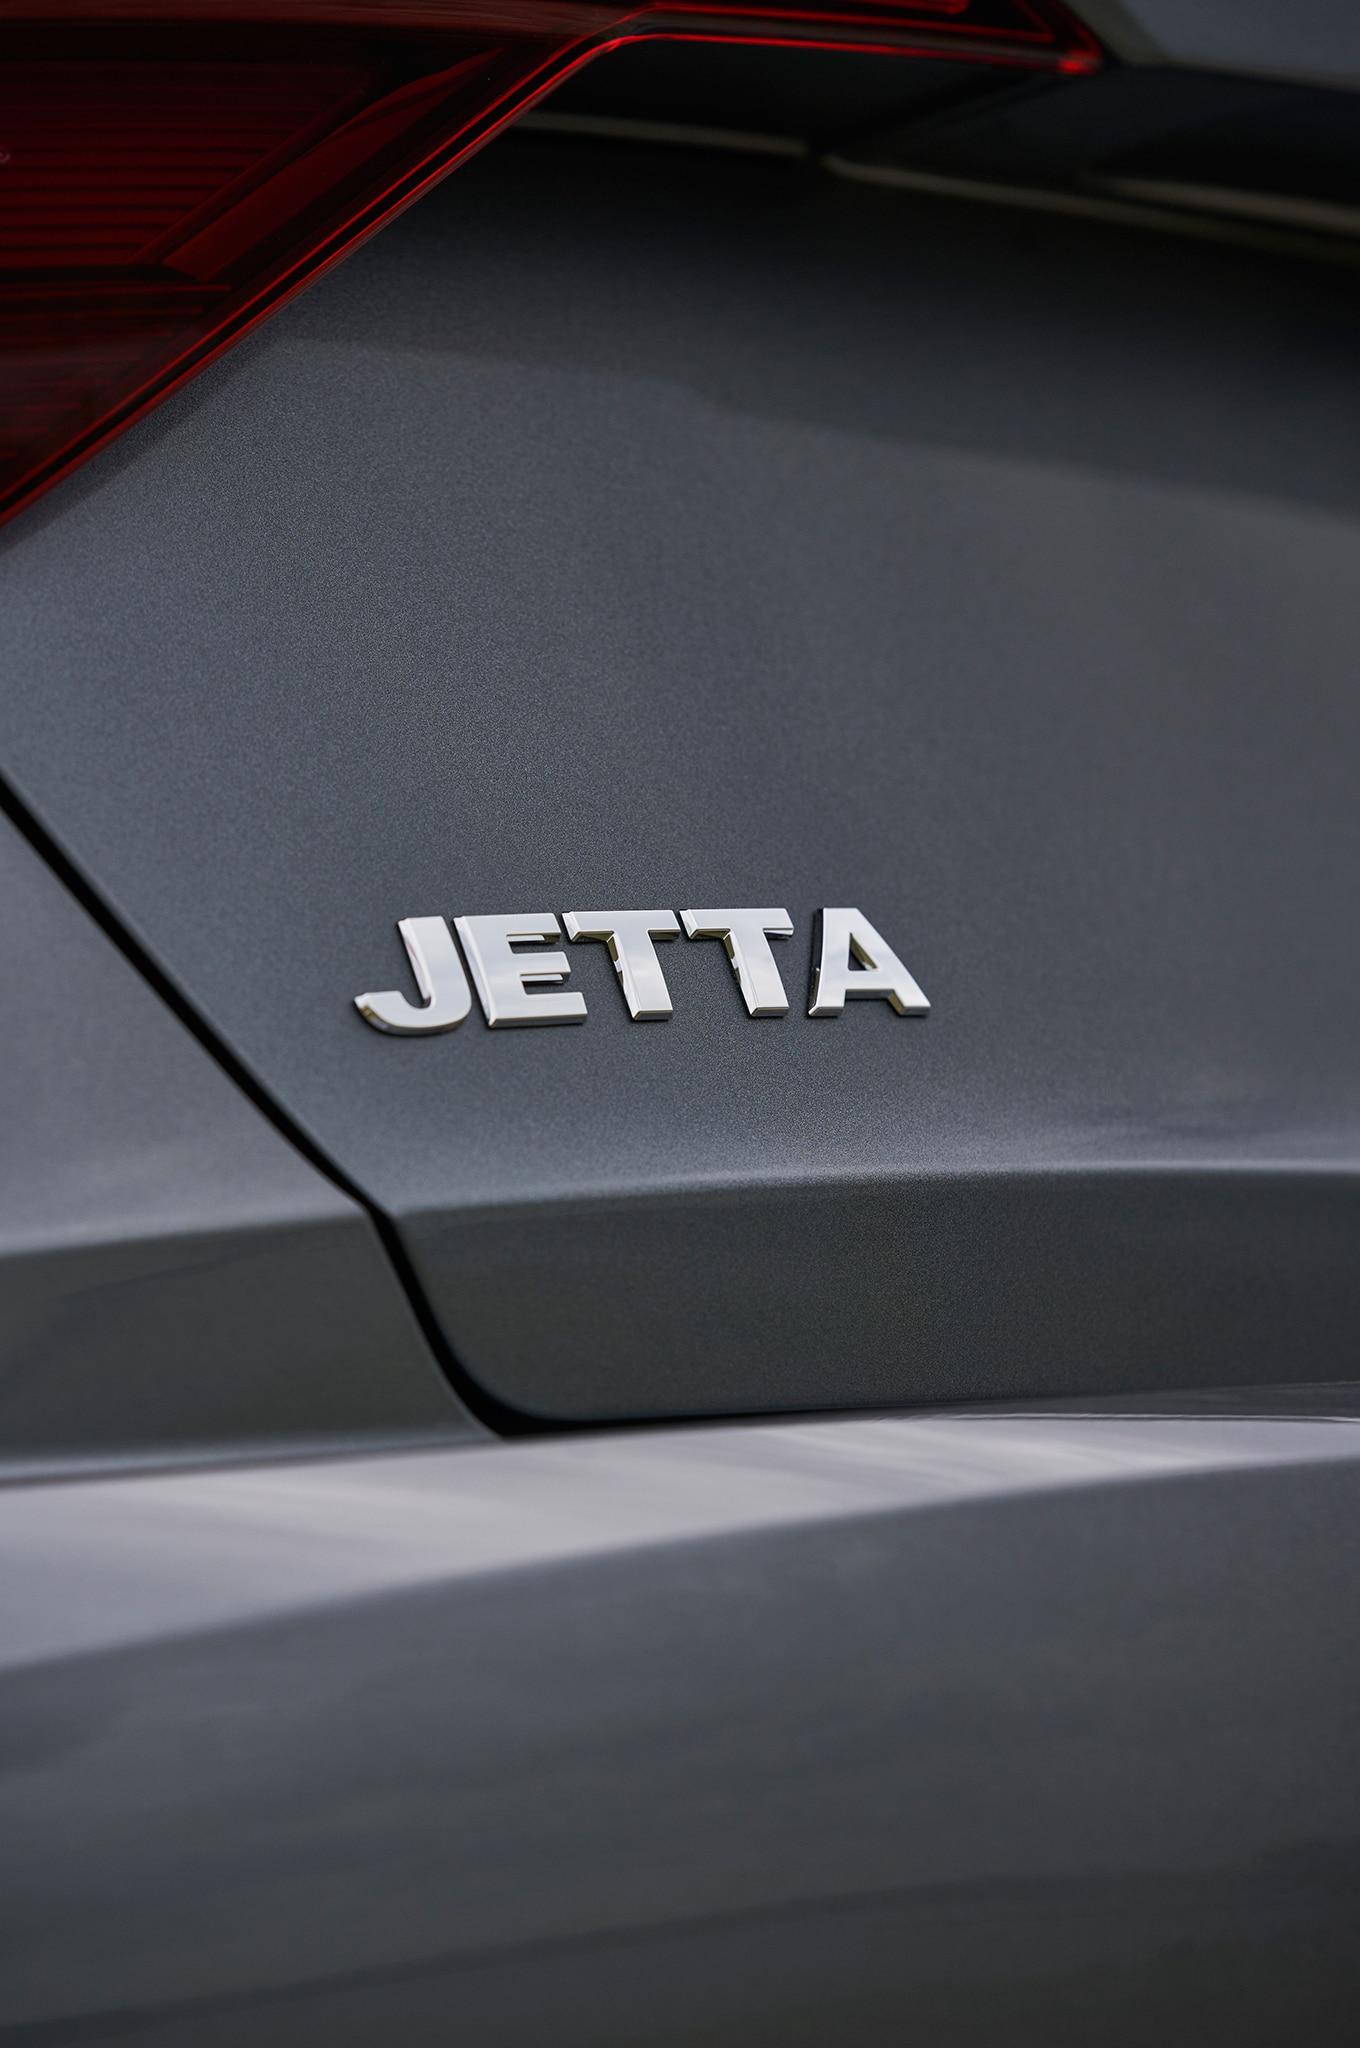 2019 Volkswagen Jetta First Drive Review | Automobile Magazine